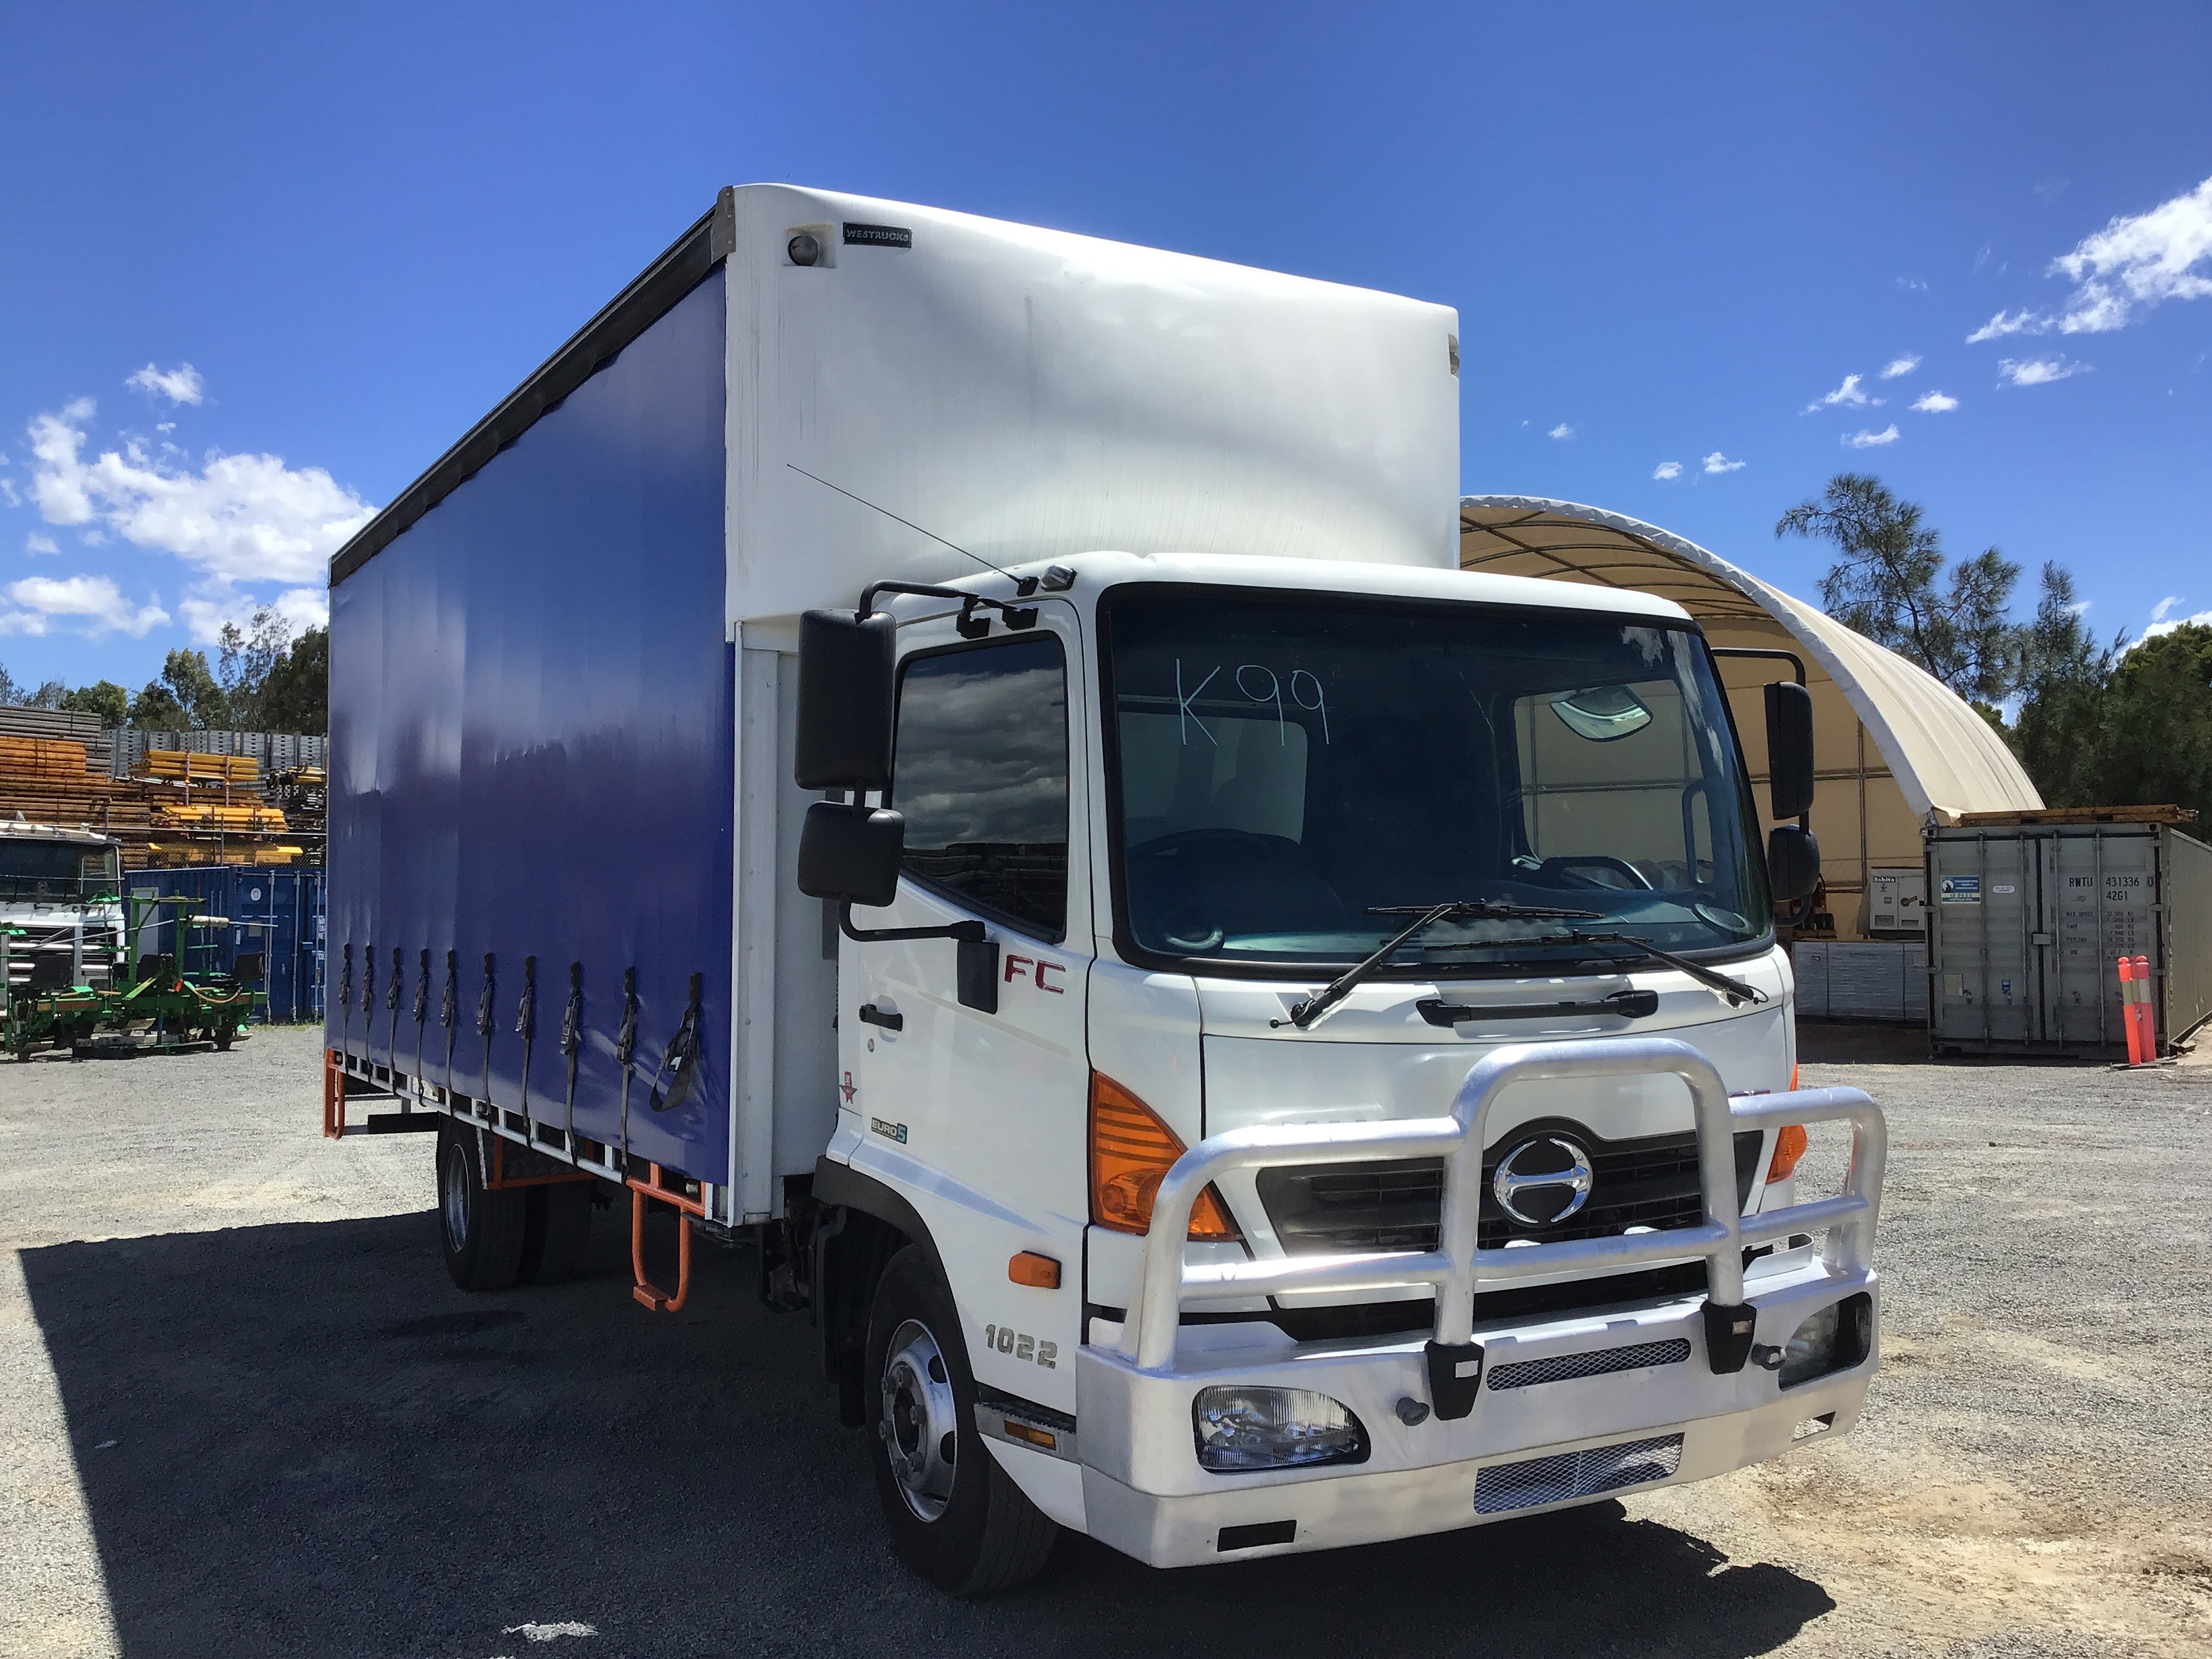 2015 Hino FC 500 /1022 4 x 2 Curtainsider Rigid Truck